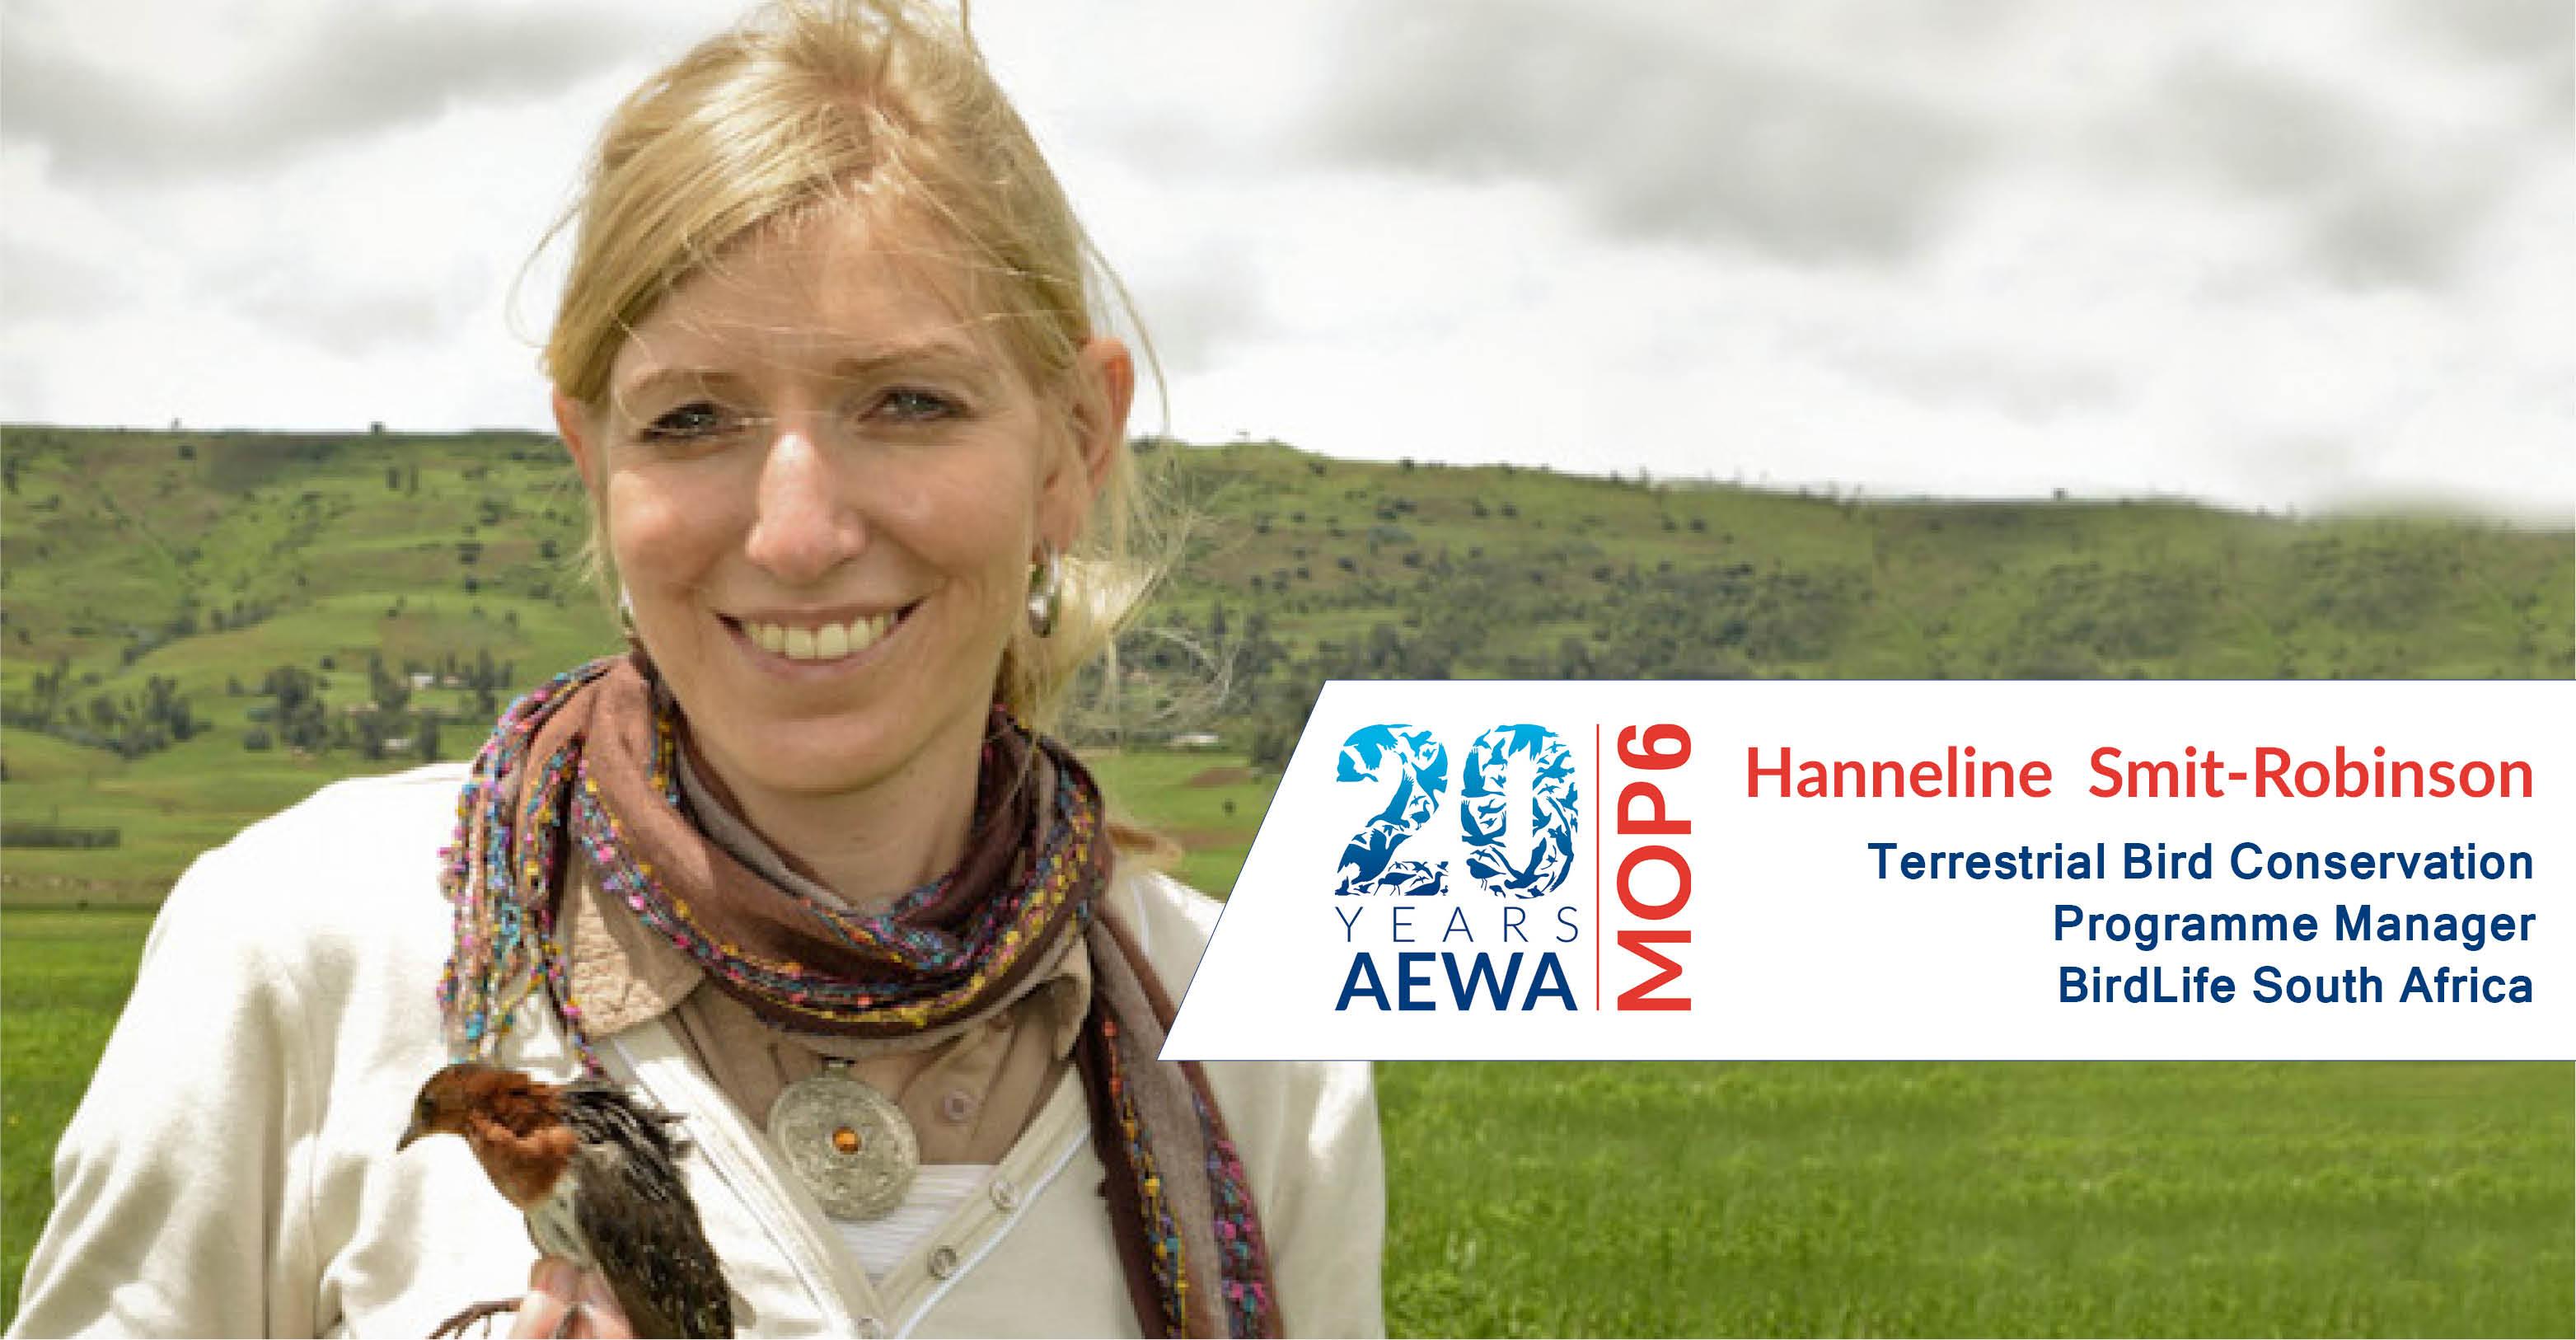 People behind AEWA - Hanneline Smit-Robinson